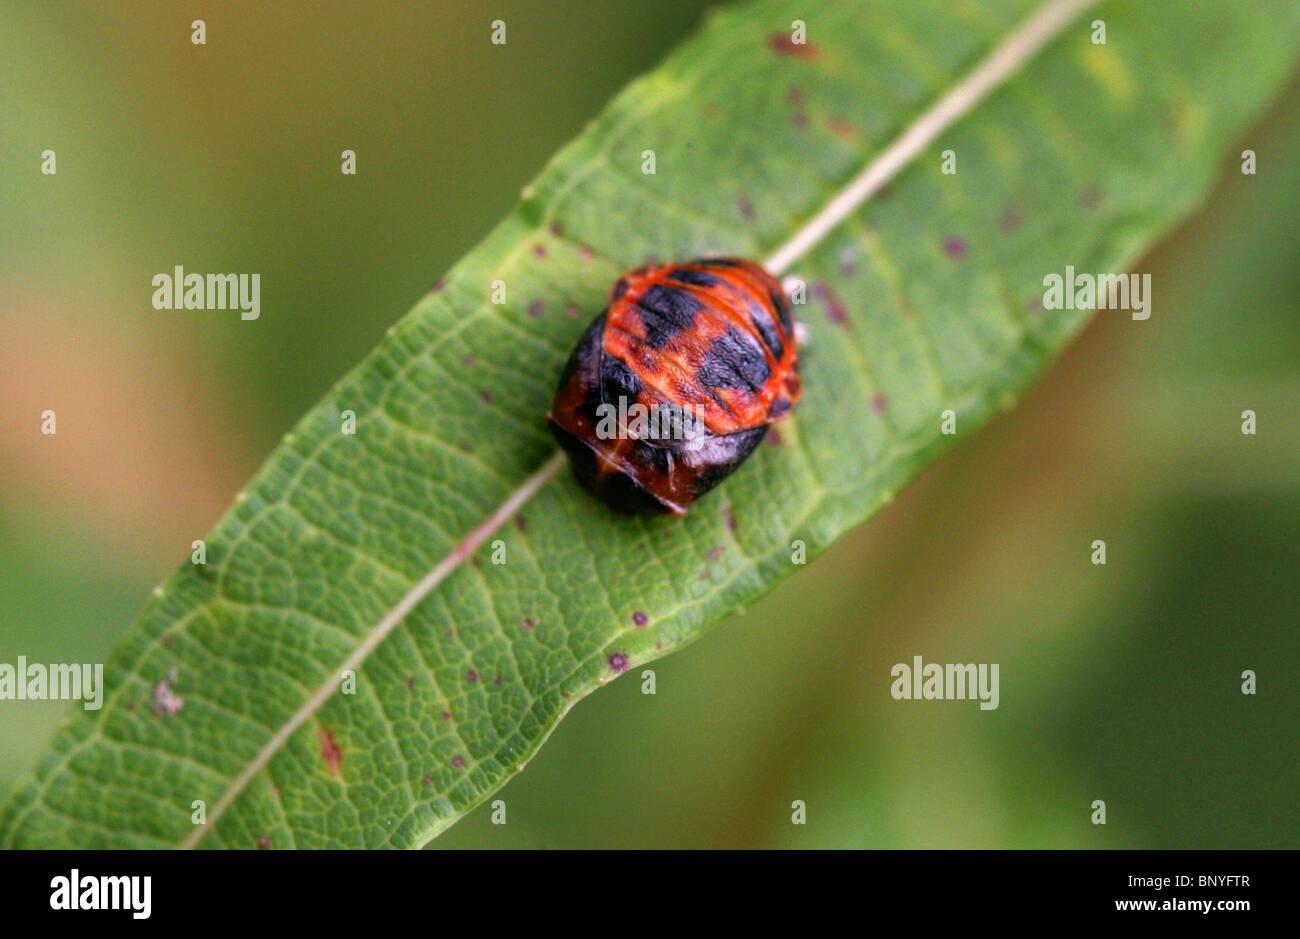 Harlequin Ladybird Pupa, Harmonia axyridis. - Stock Image